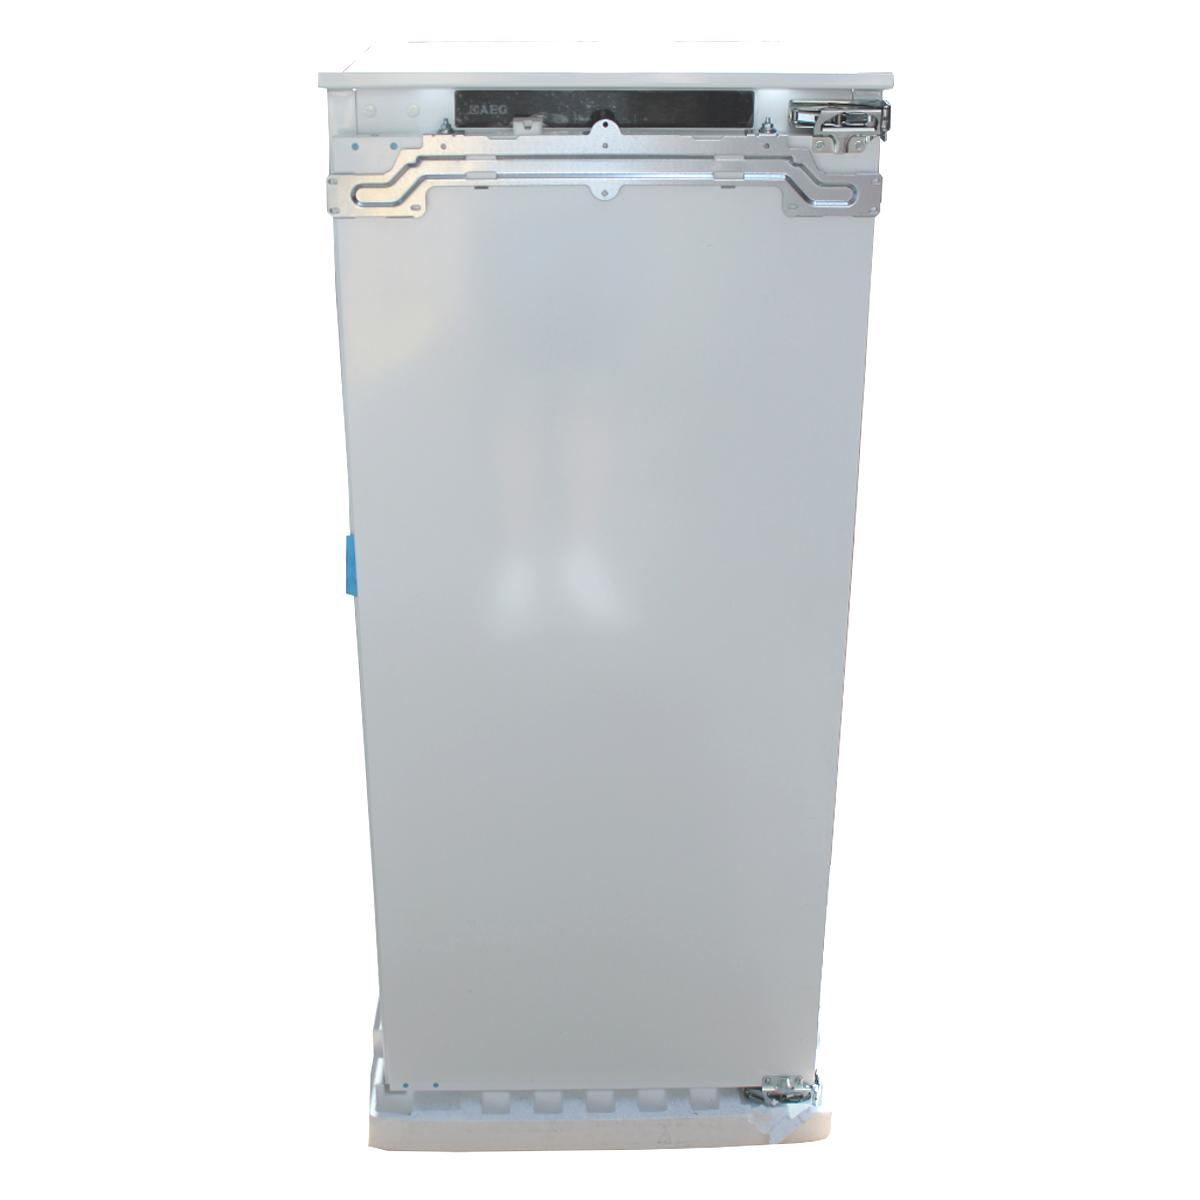 Einbau-Kühlschrank 222L 105 kWh 1219mm Höhe weiß AEG Santo ...